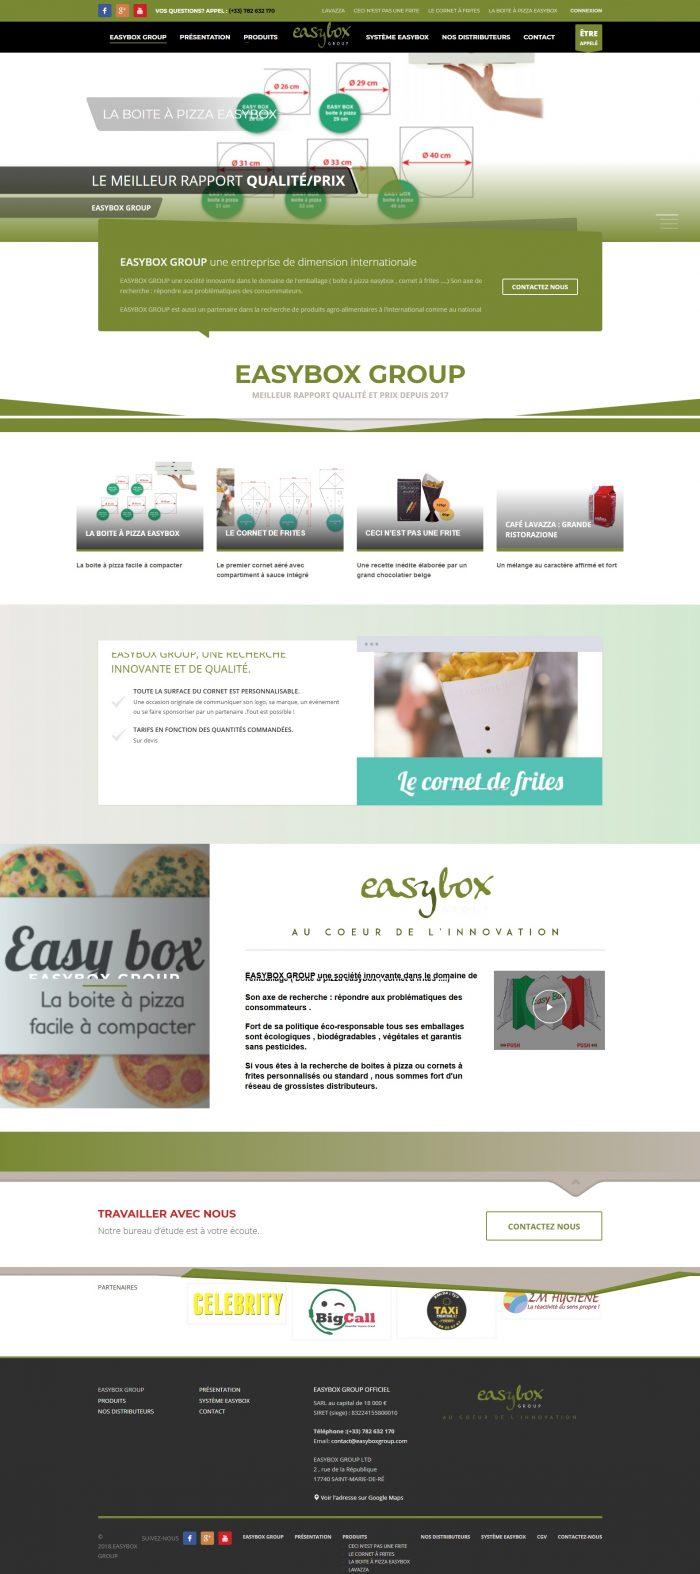 easybox-group